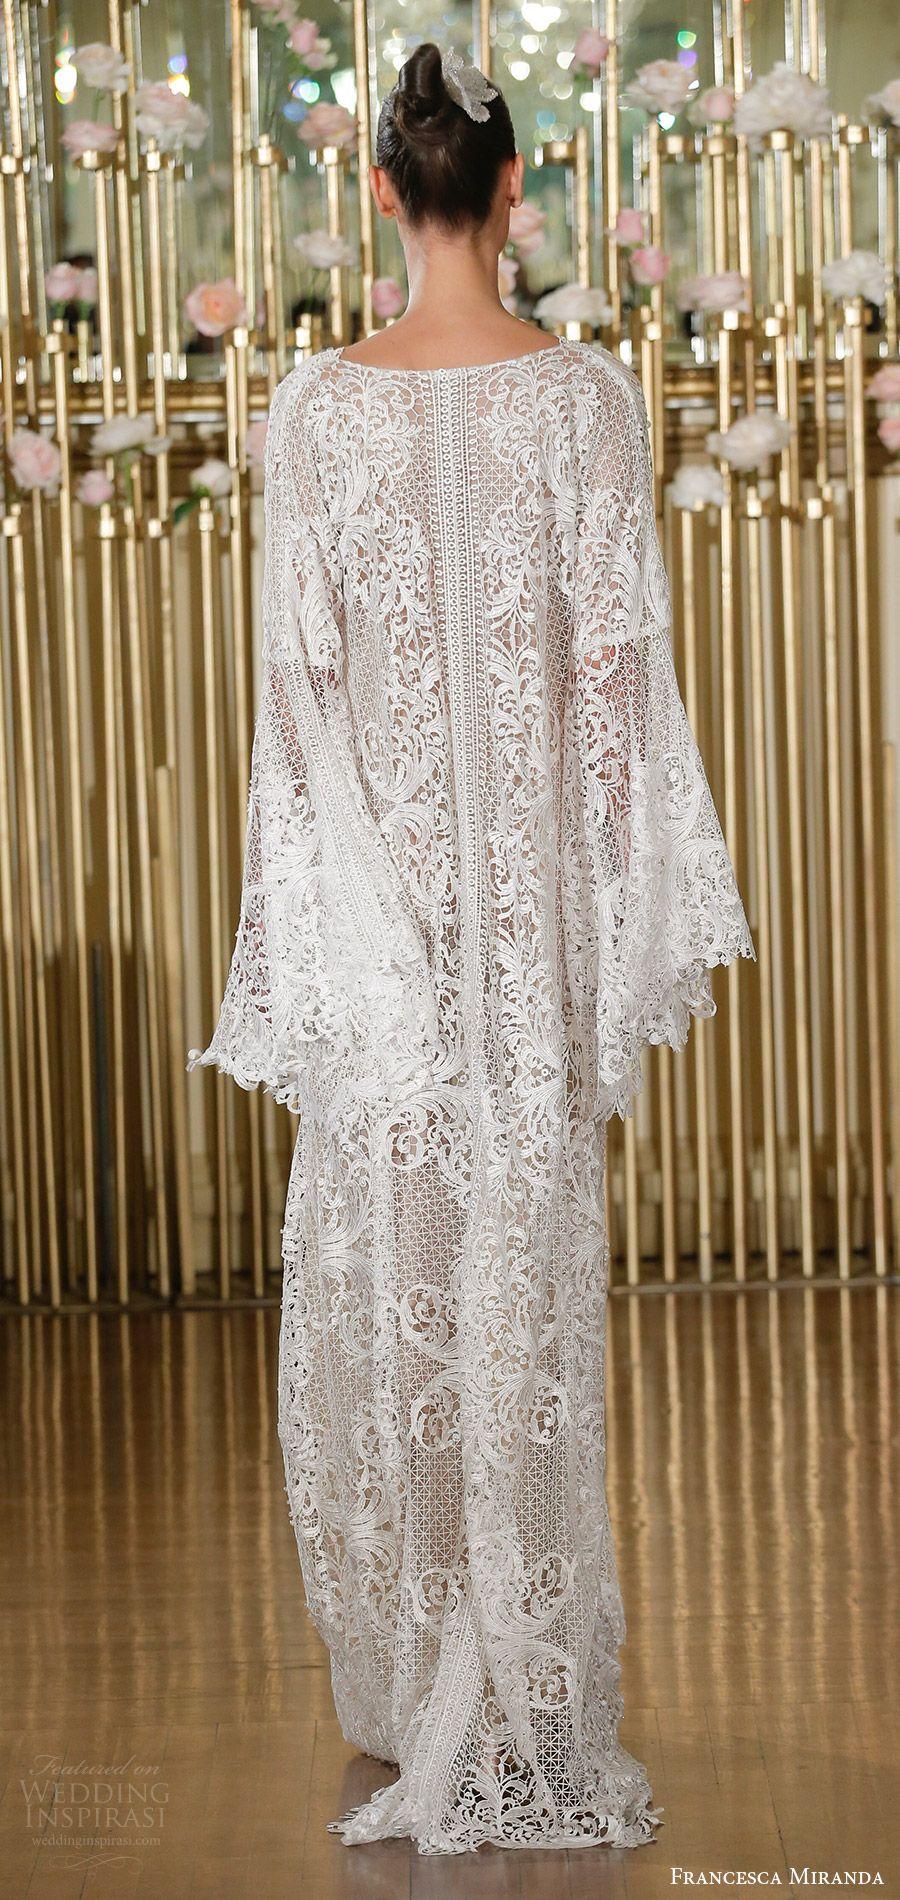 Francesca miranda spring wedding dresses u new york bridal